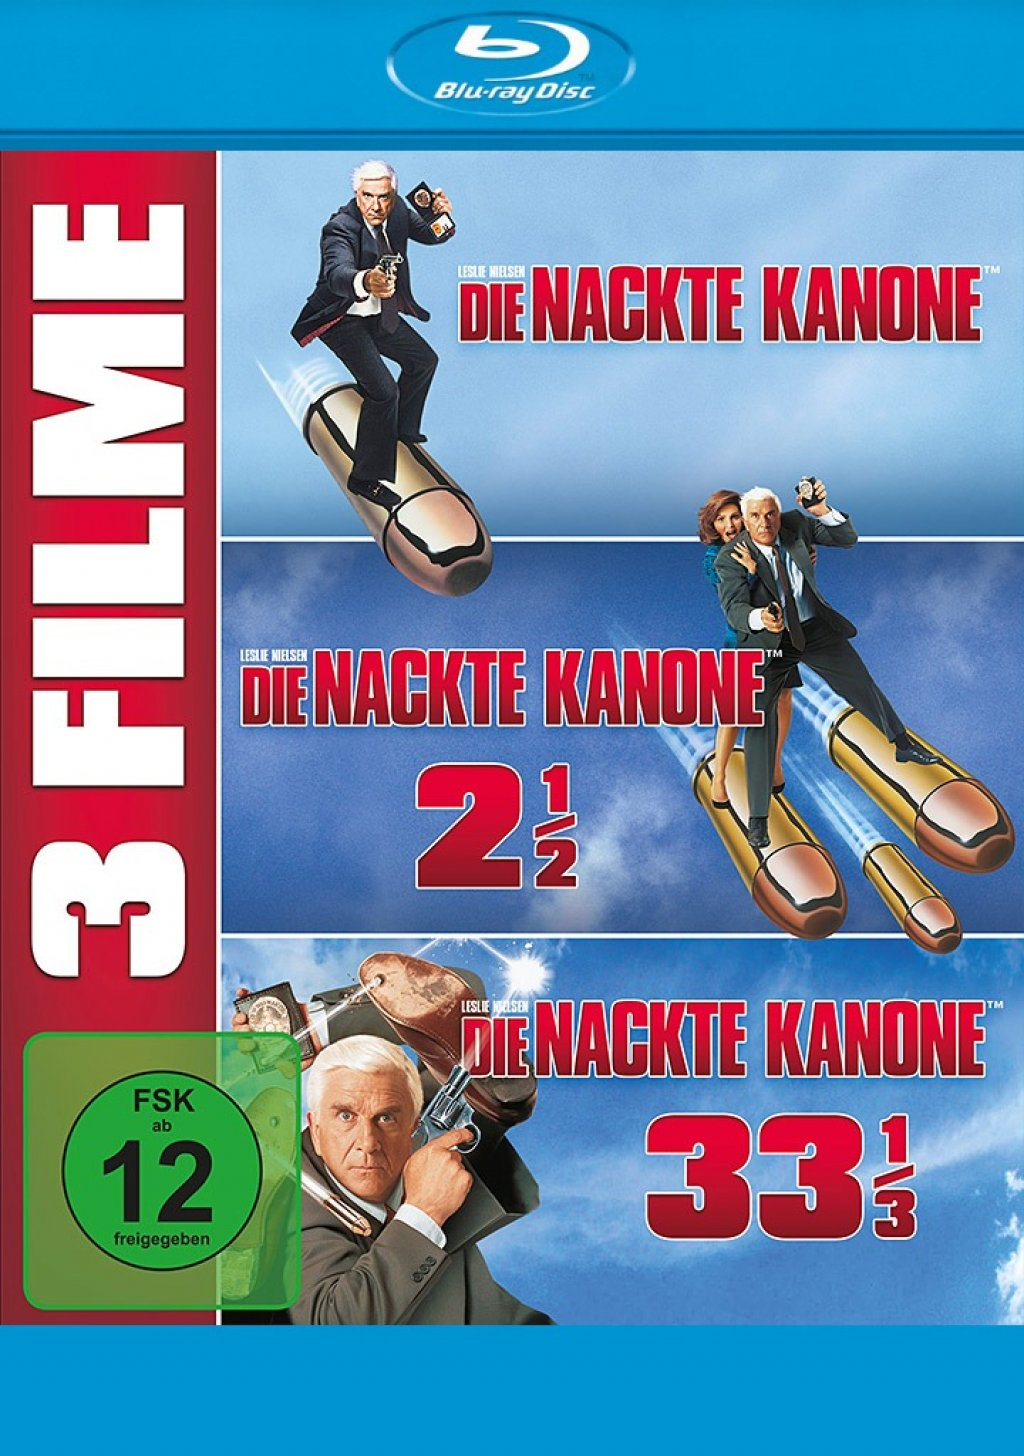 Die nackte Kanone 1-3 - 3 on 1 (Blu-ray)